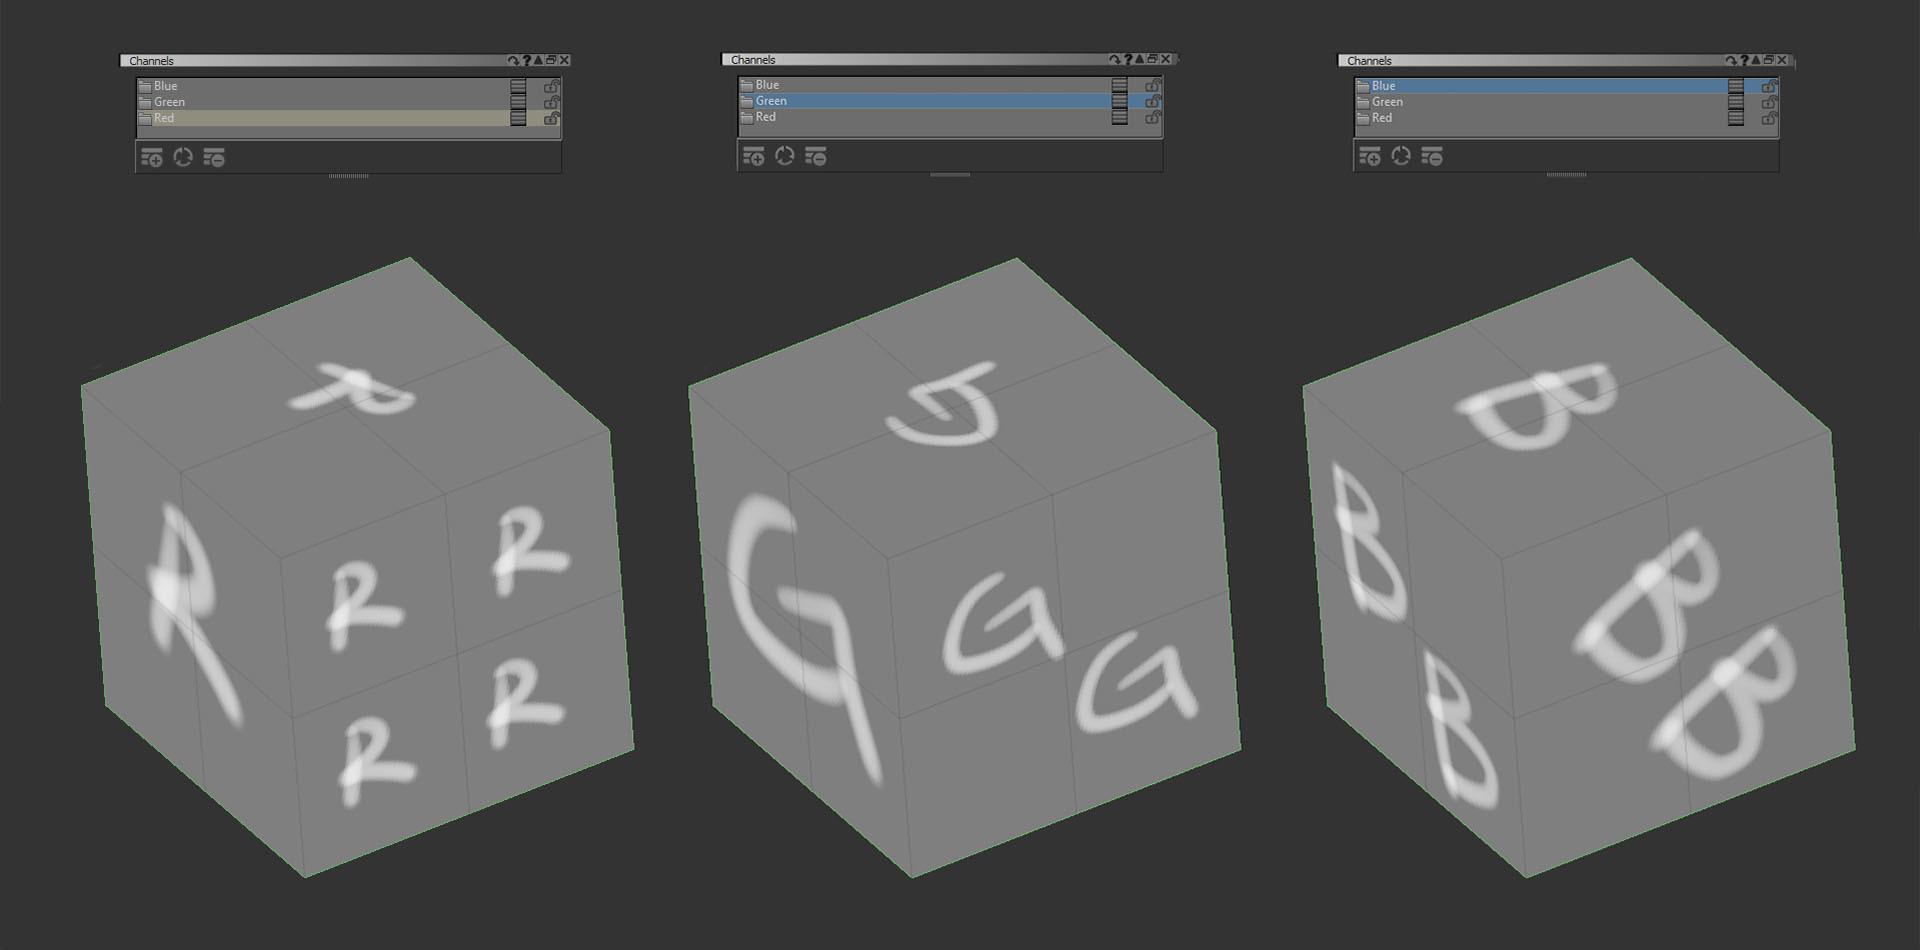 Dusan Kovic - CG Artist - Single rgb texture for multiple